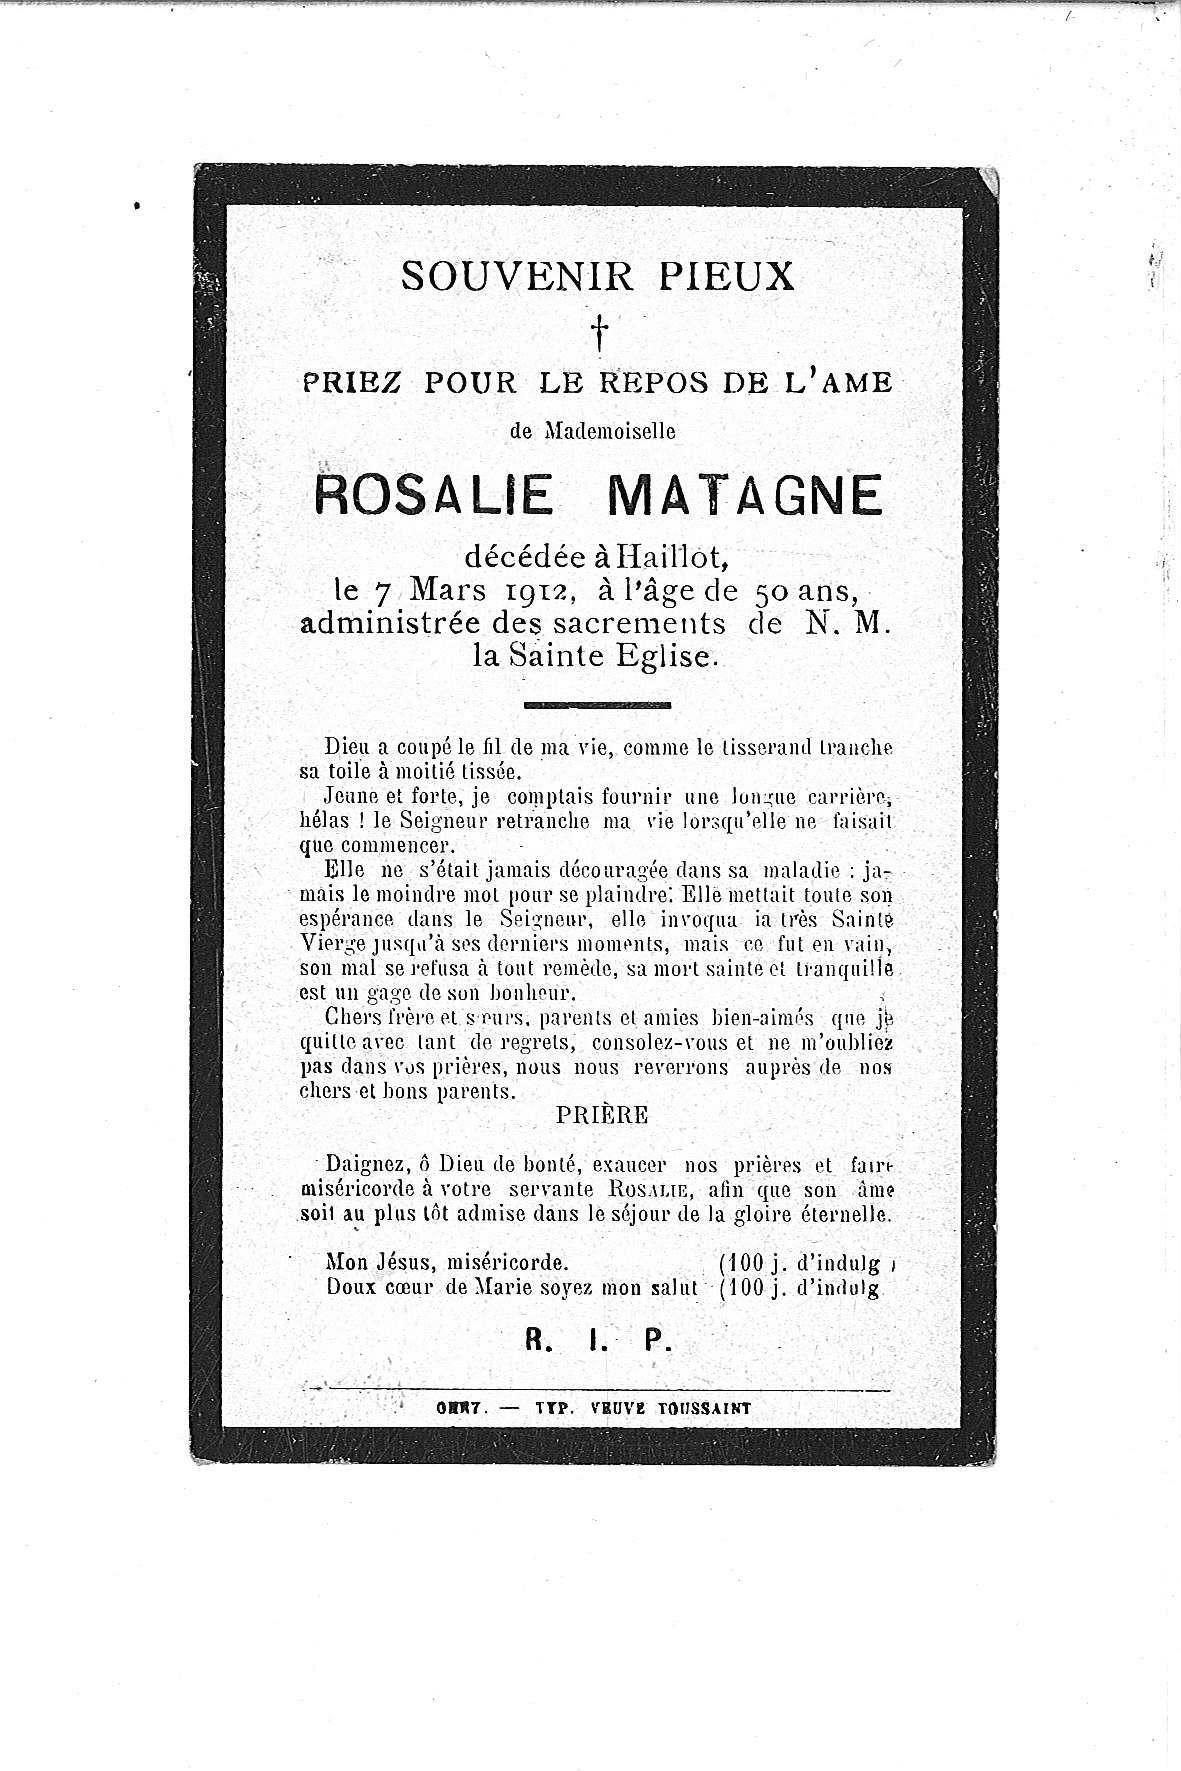 Rosalie(1912)20120227085536_00081.jpg